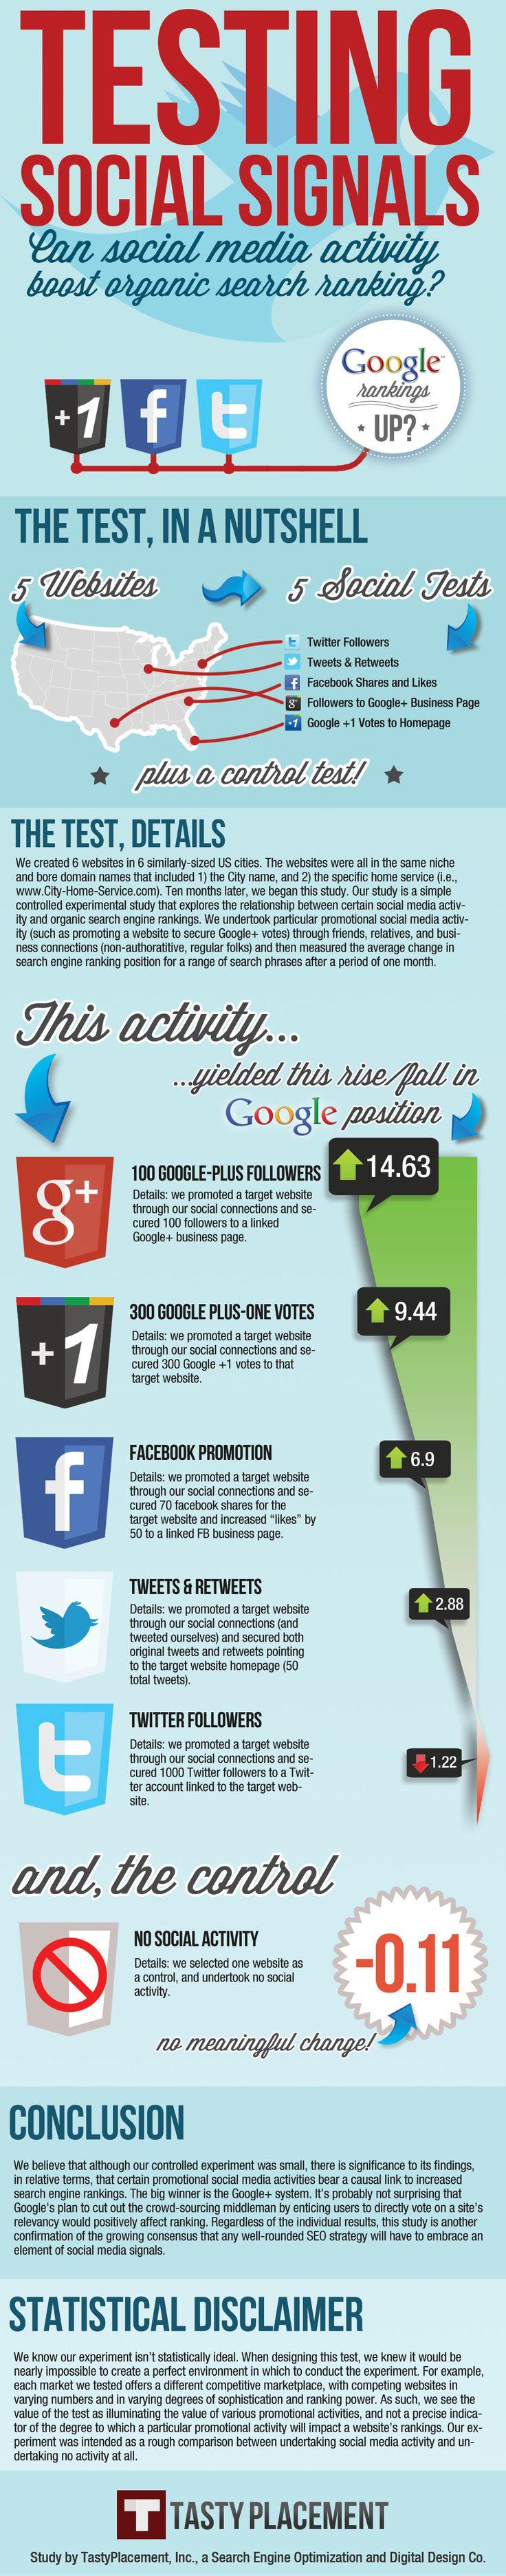 Testing social signals: Can social media improve search rankings? #SocialMedia #SEO #infographic